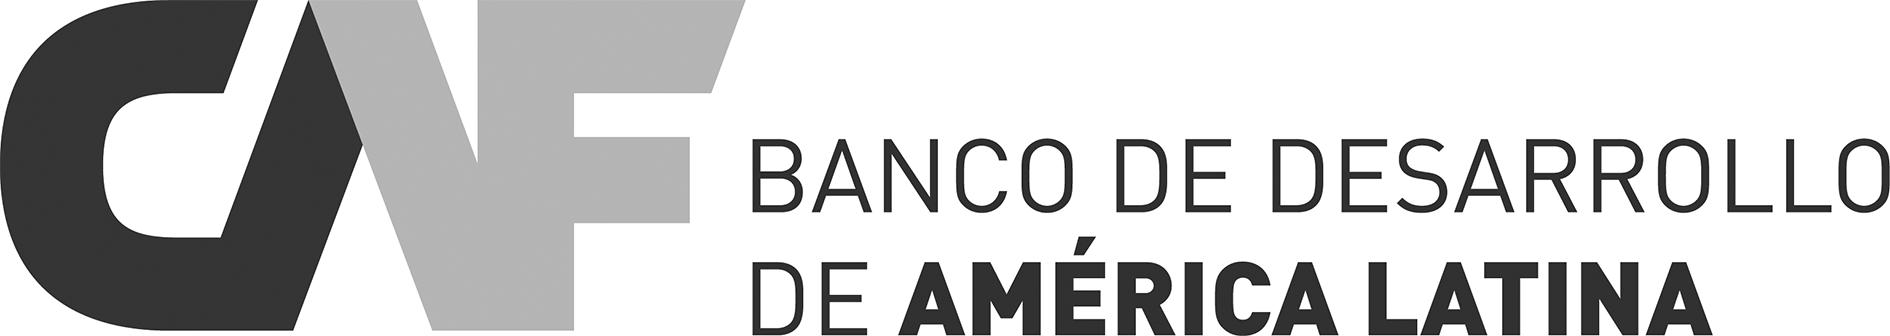 FTS GRUOP Partner BANCO DE DESARROLLO DE AMÉRICA LATINA